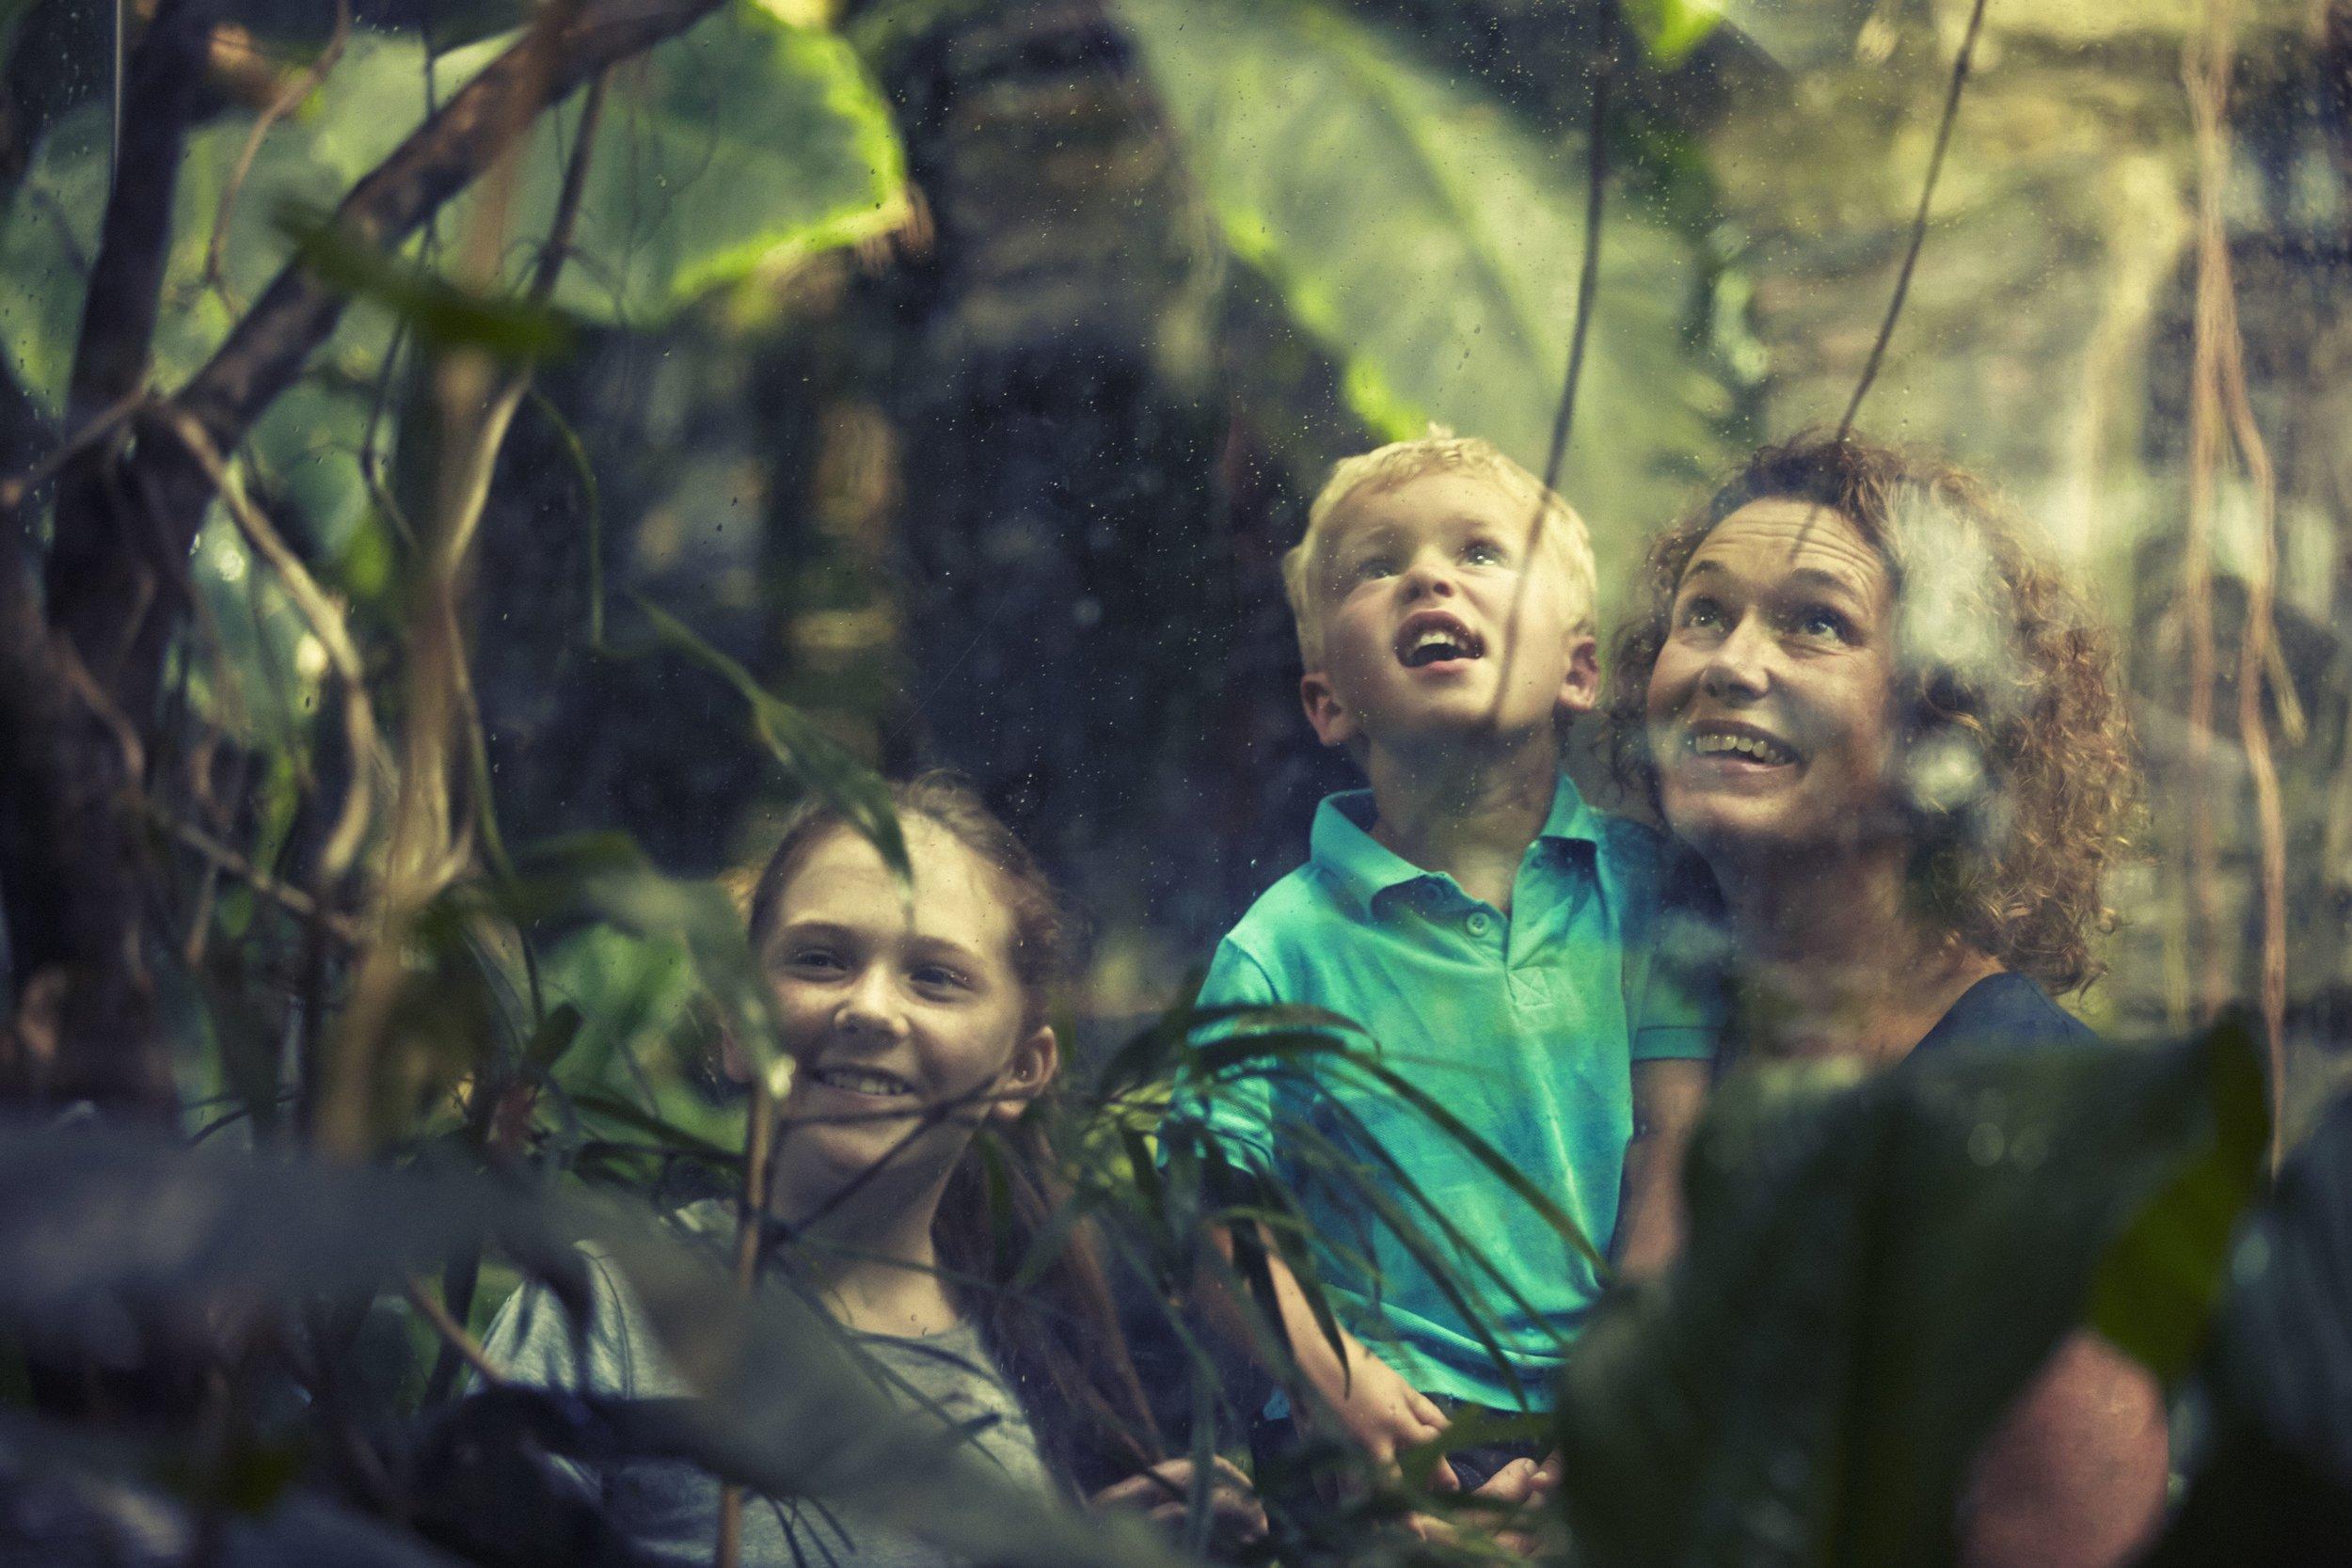 Universeum rainforest (Image credit: Kim Svensson/Göteborg & Co)